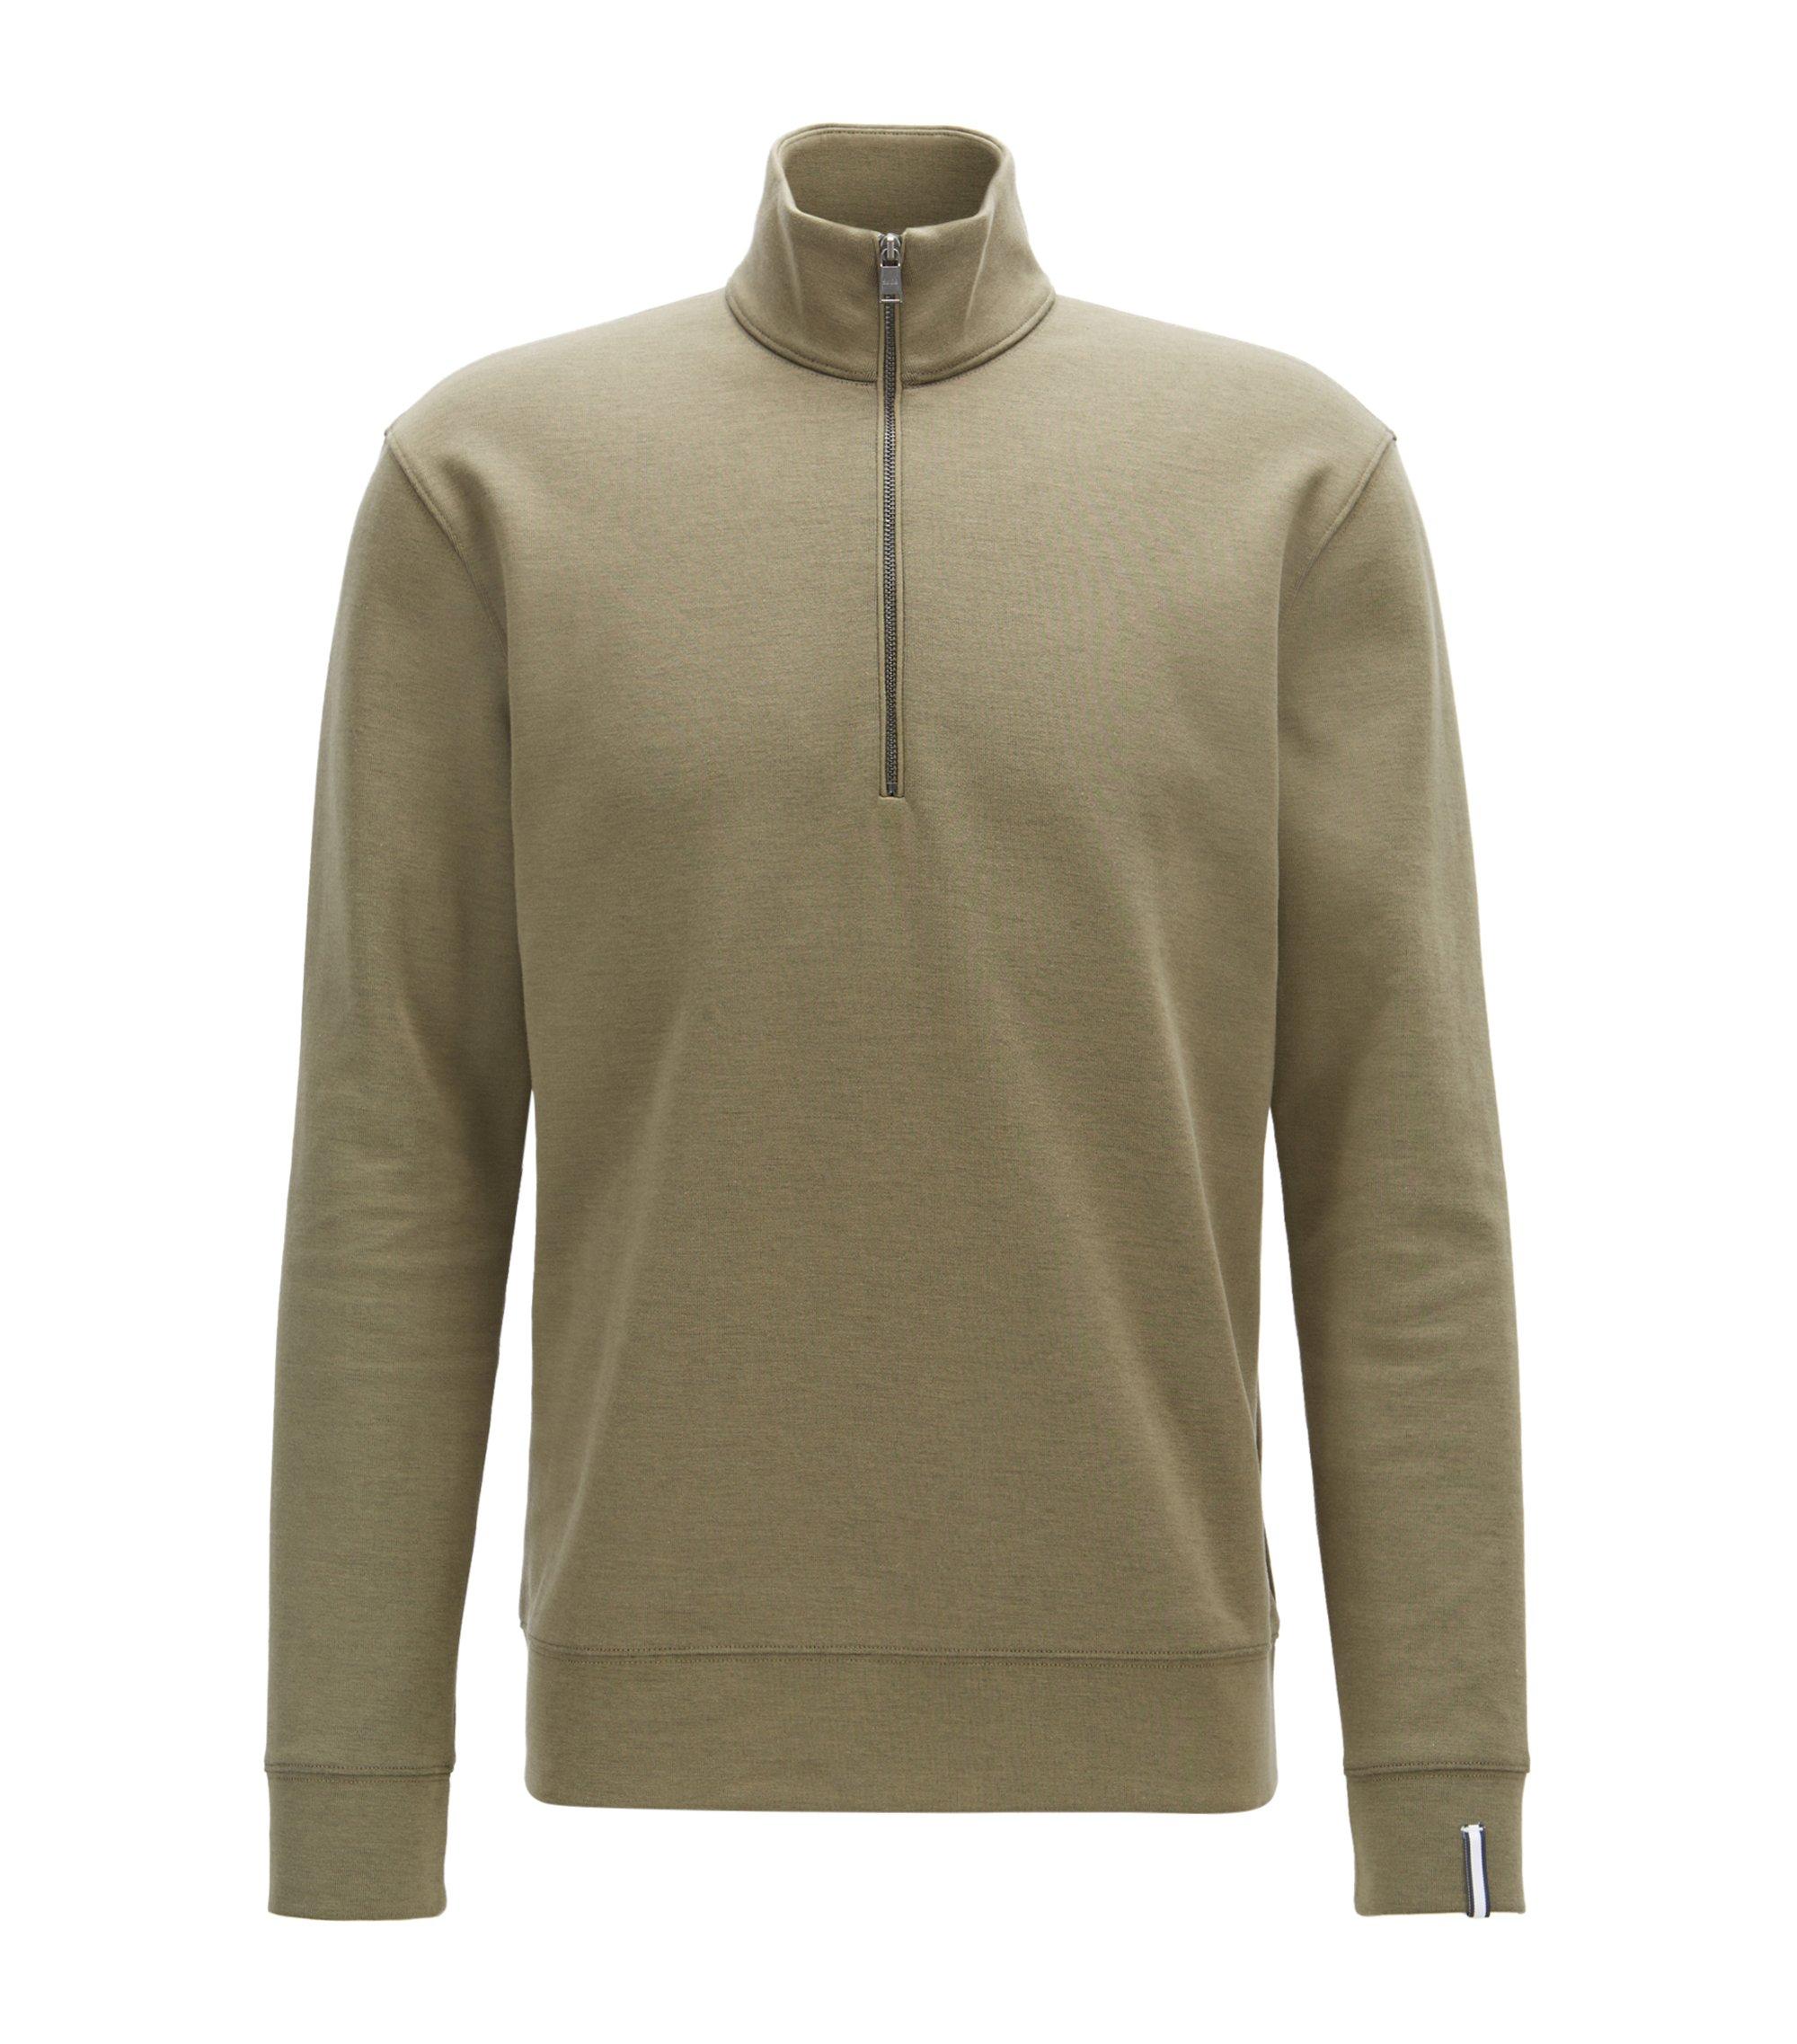 Zip-neck sweatshirt in a double-face cotton blend, Open Green